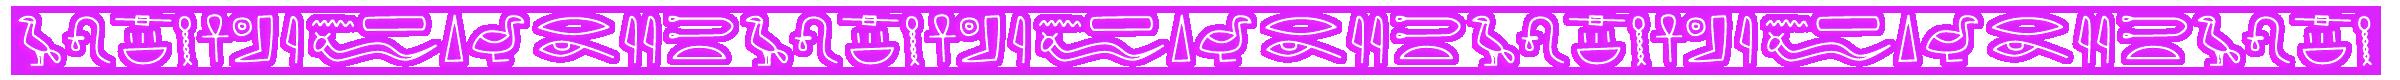 Egyptian Symbolsneon